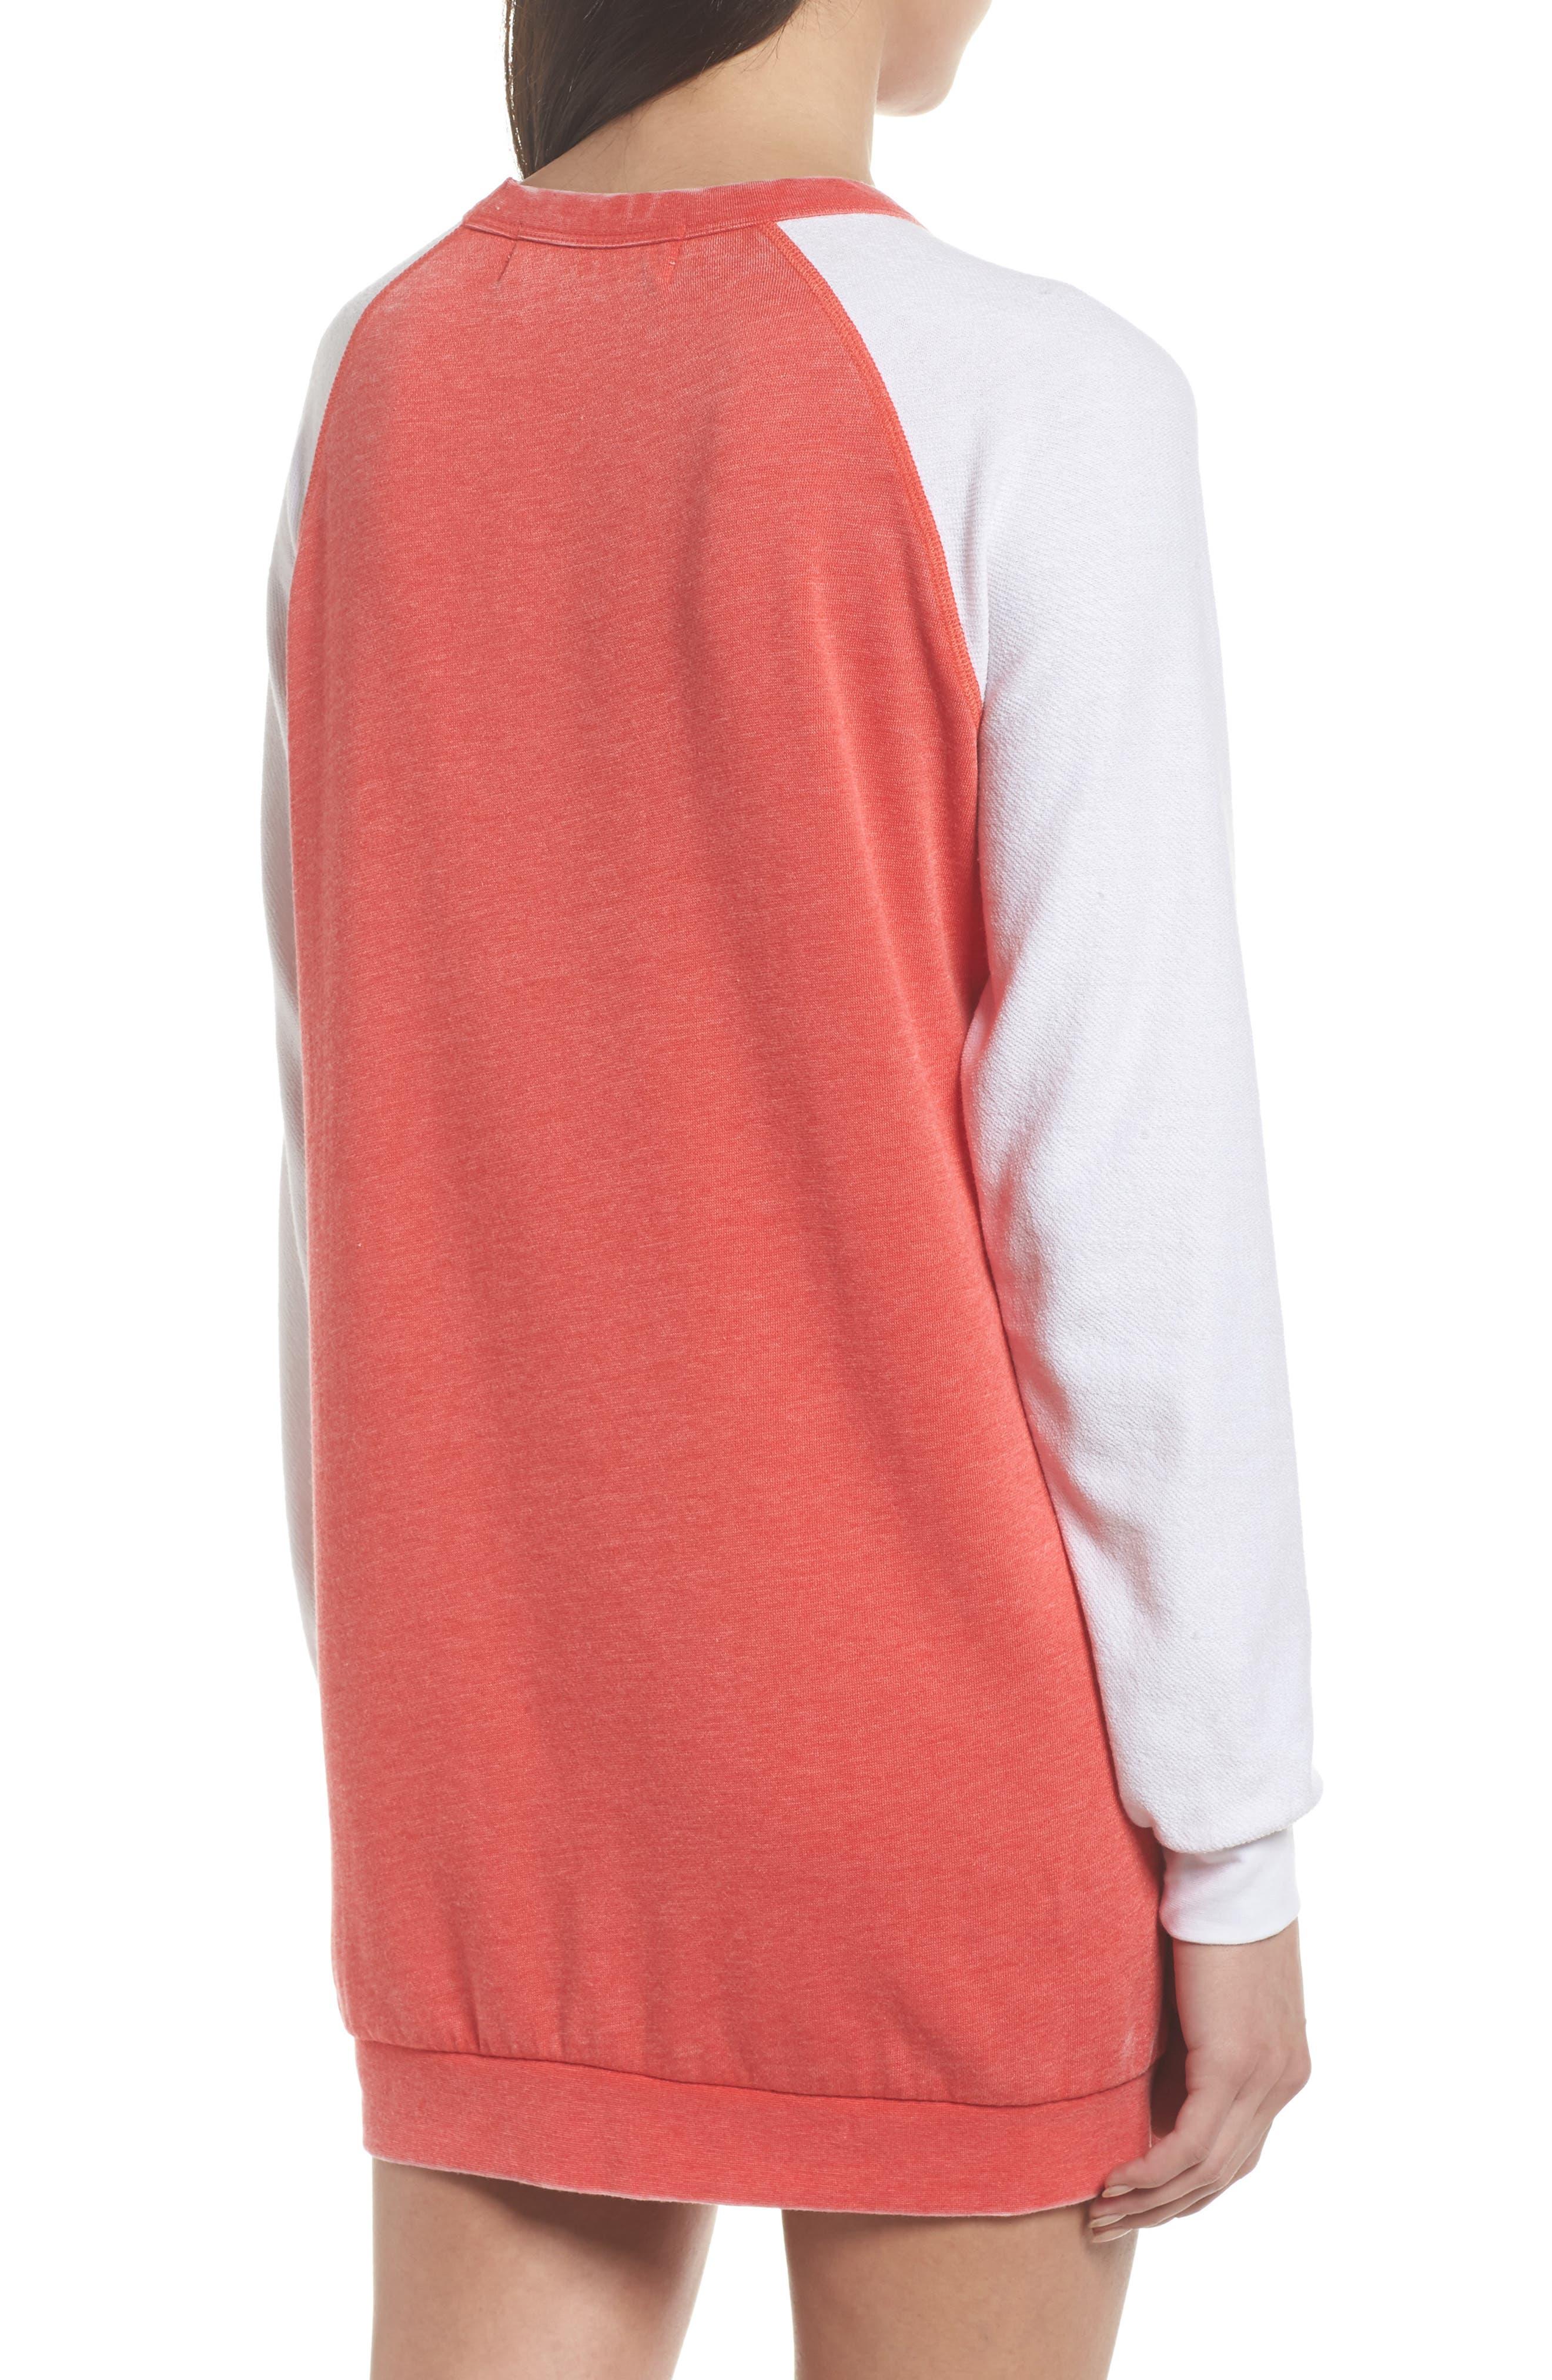 Lounge Sweatshirt Dress,                             Alternate thumbnail 2, color,                             Love Red/ White